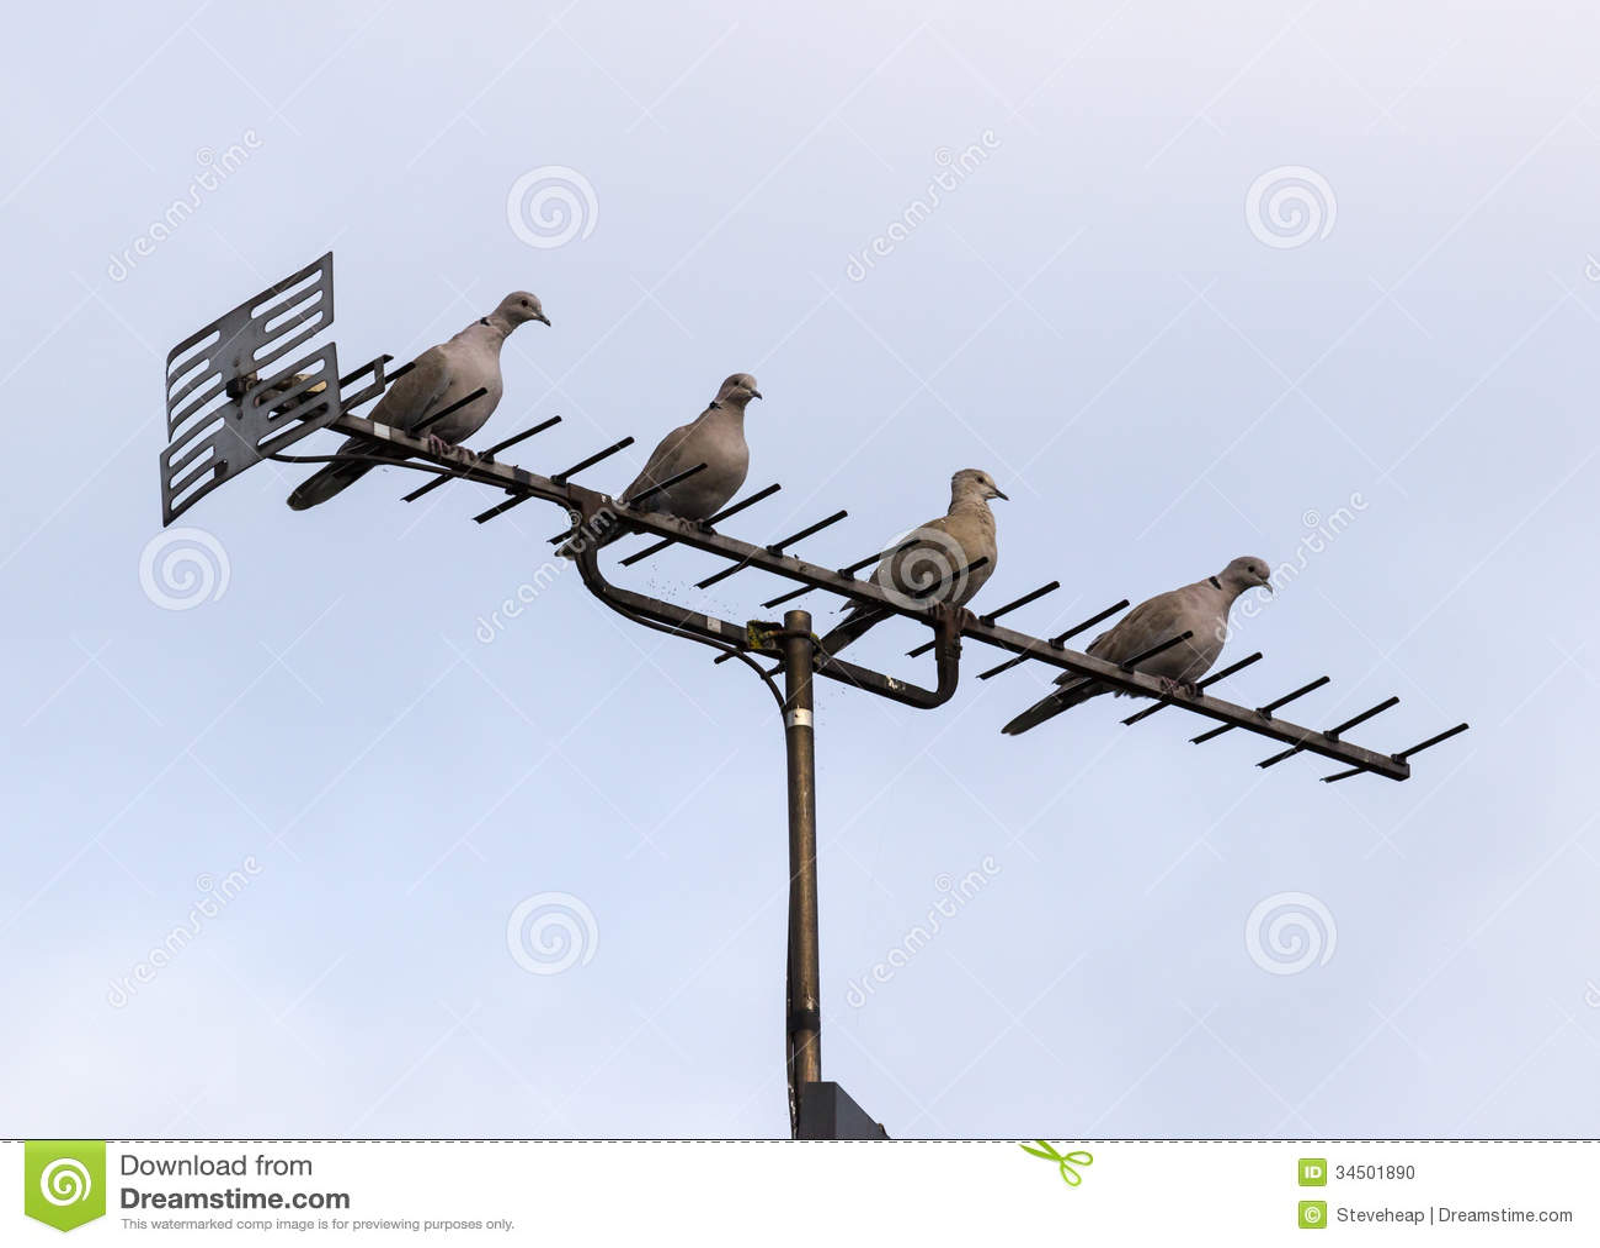 De antenne of de antenne van tv met vier duiven stock foto for Antenne de tv exterieur